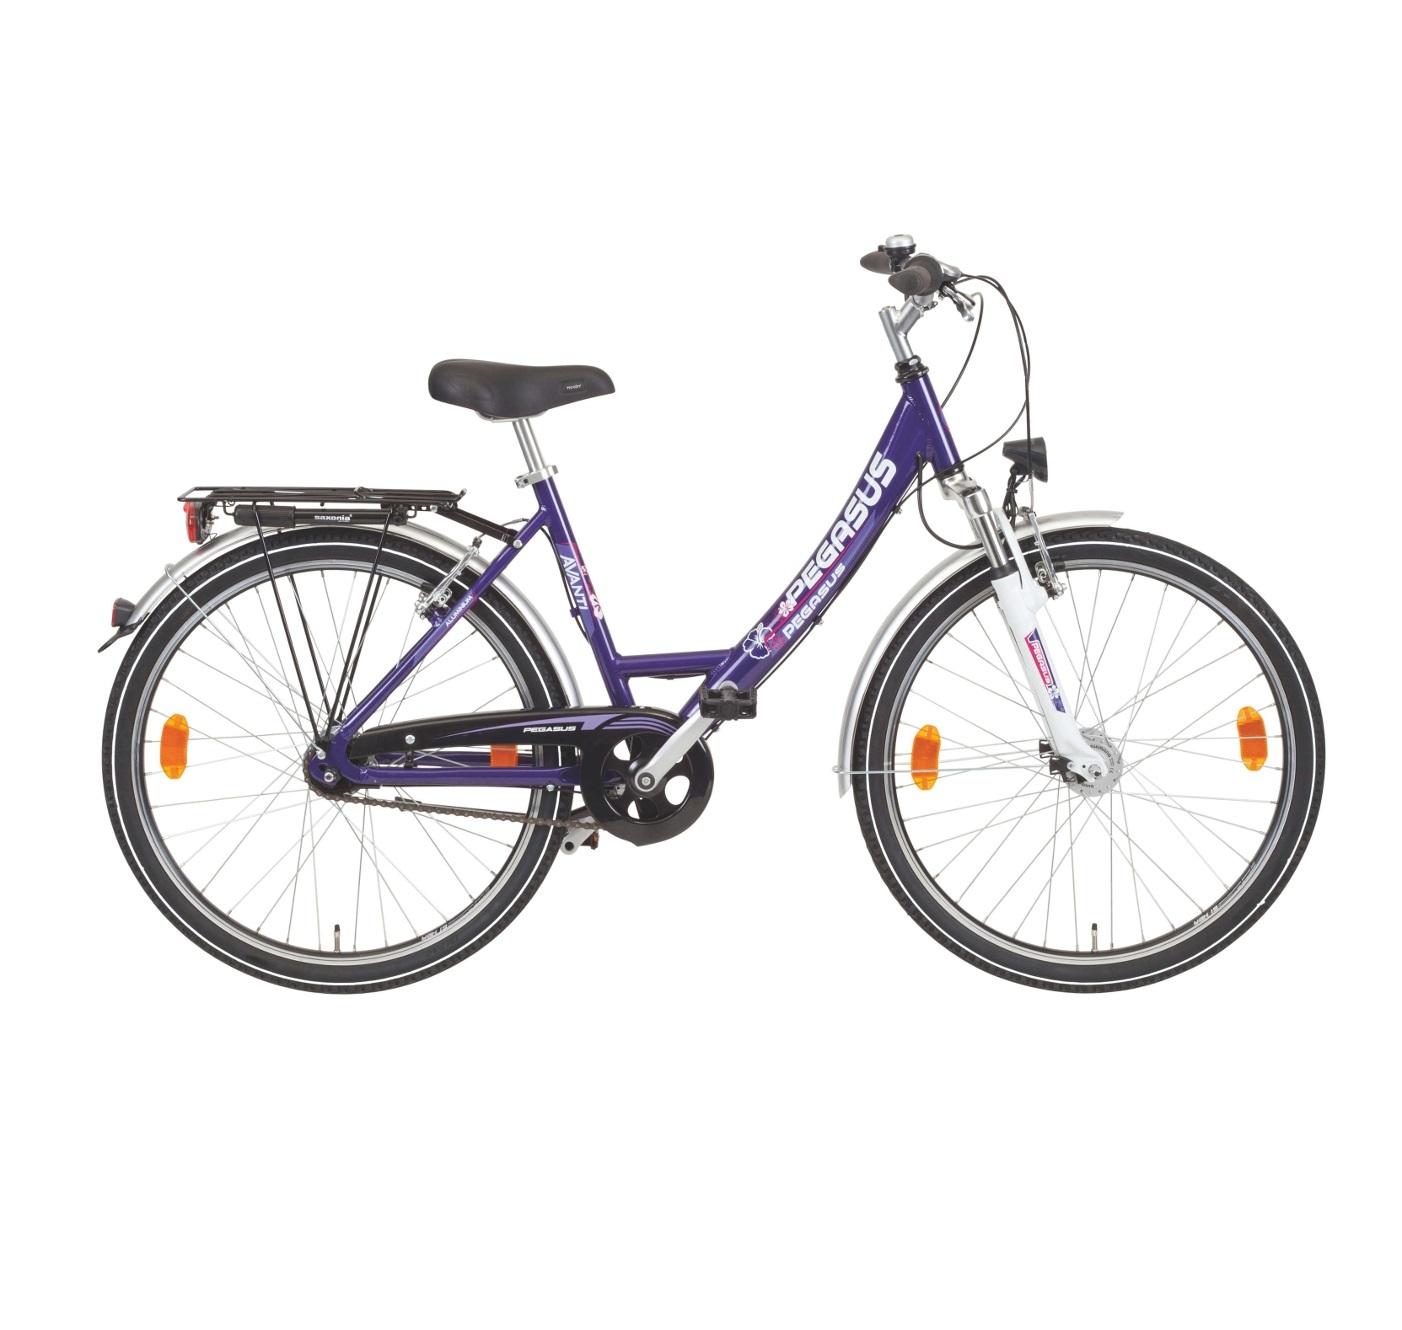 fahrrad pegasus avanti 26 zoll m dchen city bike shimano 7. Black Bedroom Furniture Sets. Home Design Ideas